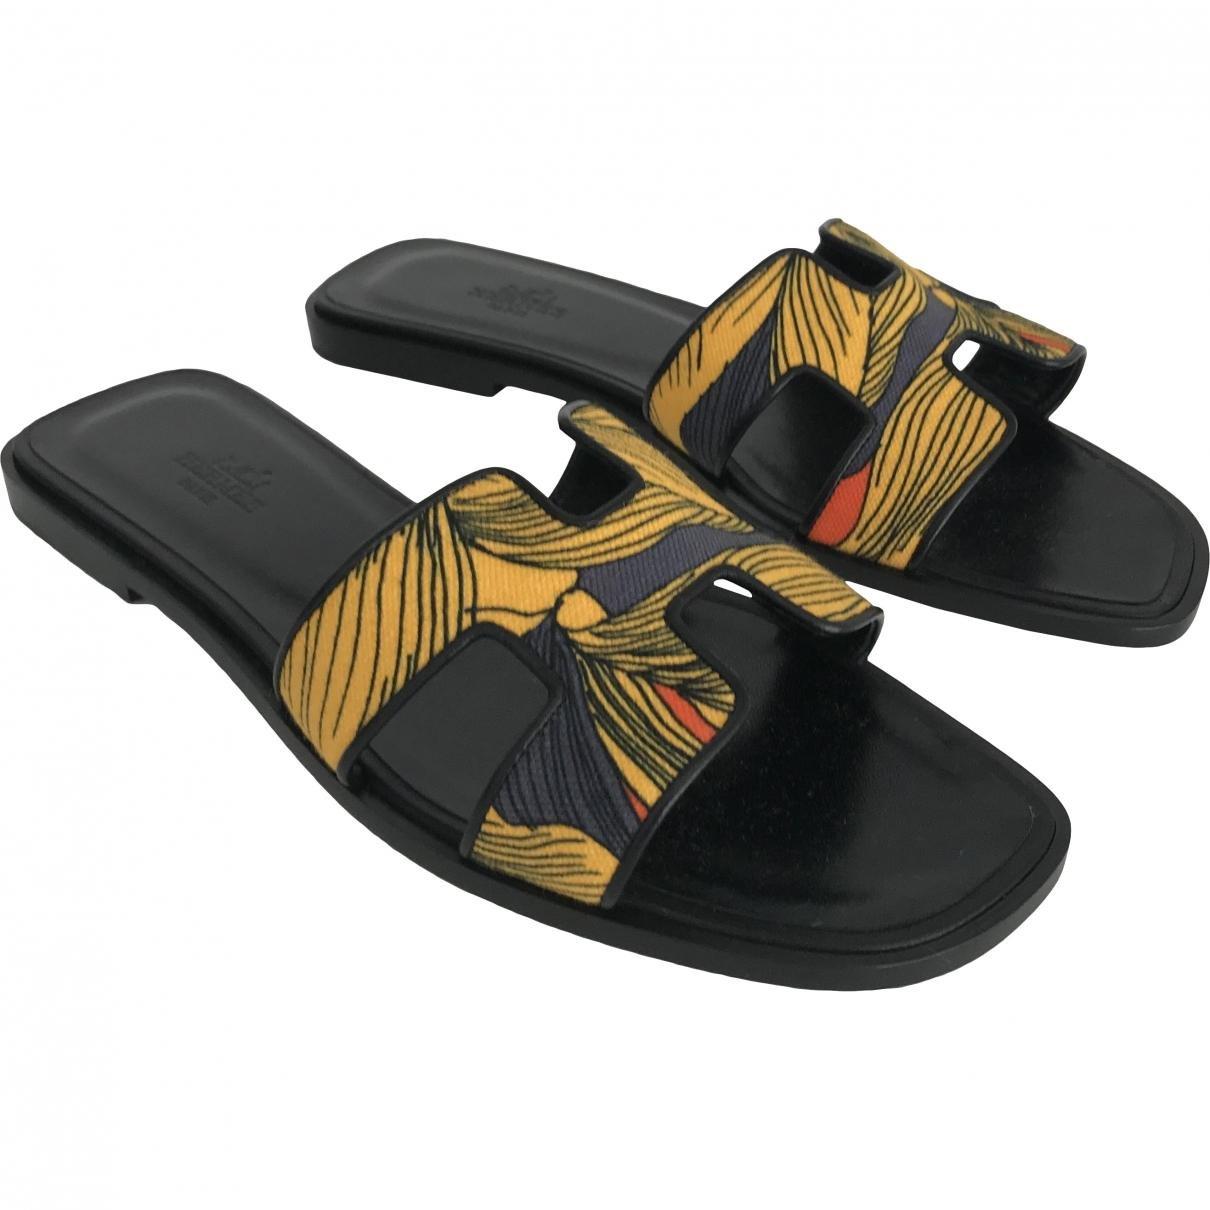 a41e3f2d200c Lyst - Hermès Pre-owned Oran Multicolour Leather Sandals in Black